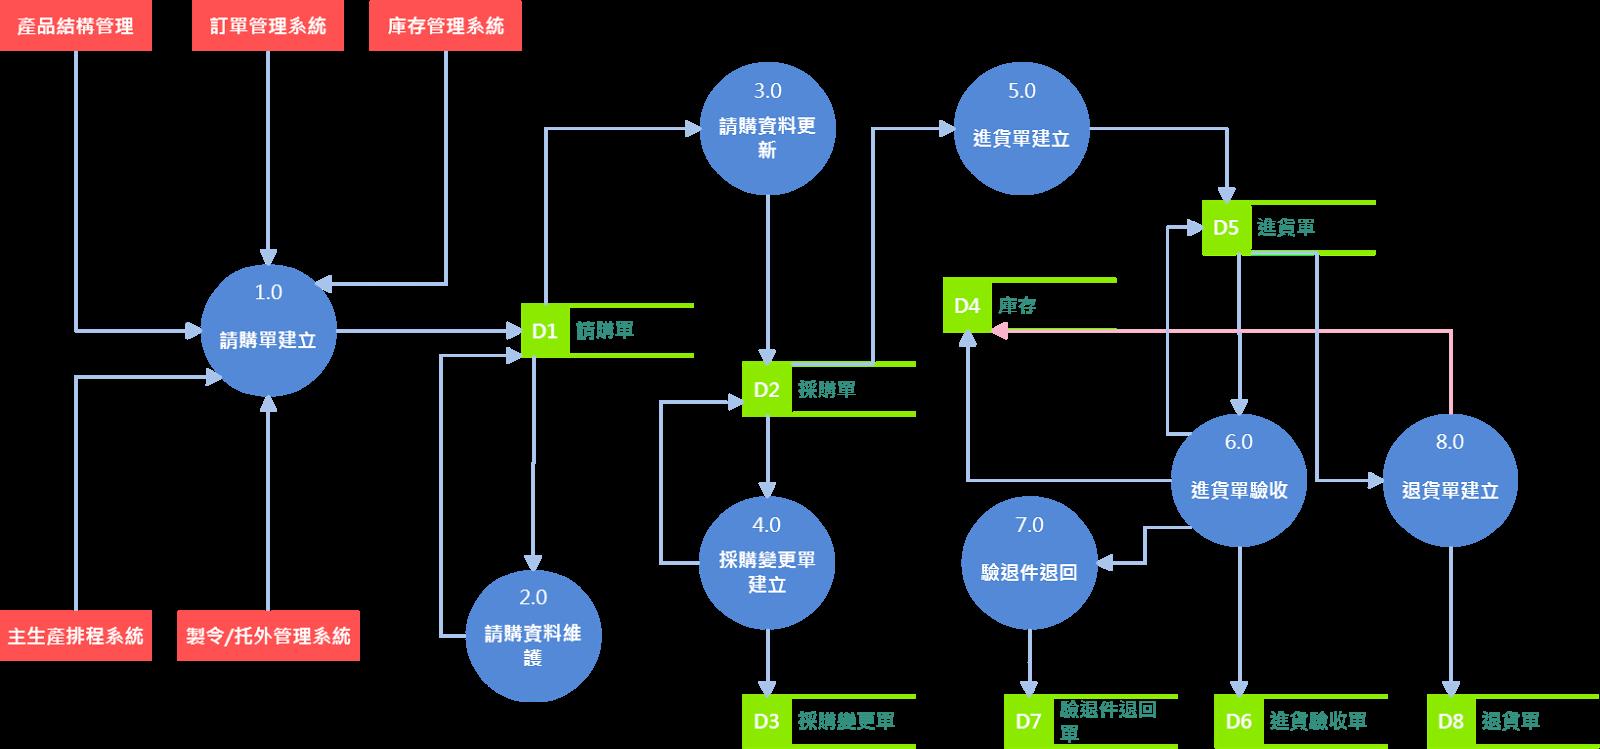 [ERP] 鼎新WFGP流程分析 - 採購管理系統 | 育偉的學習記事